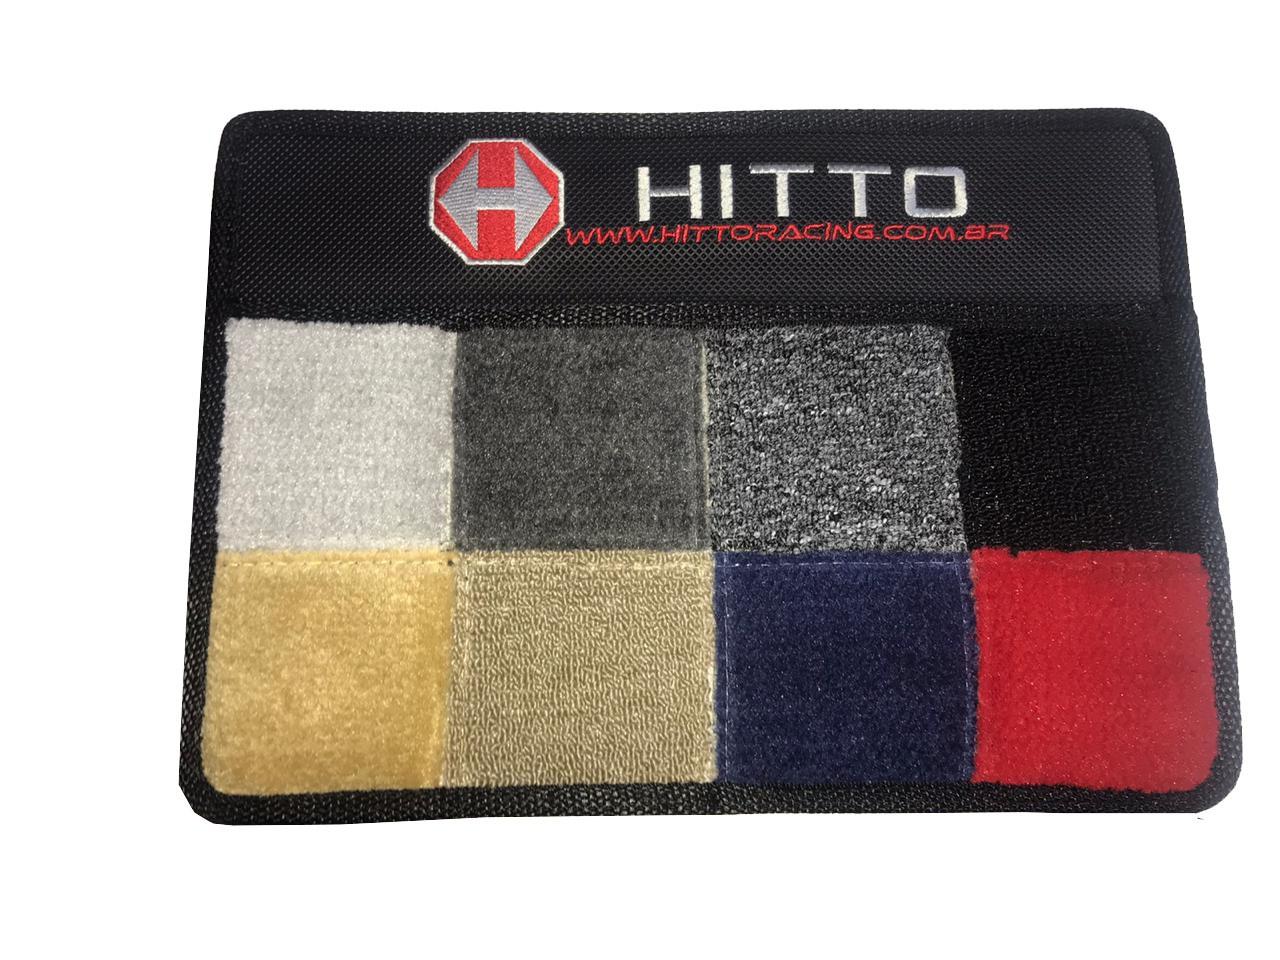 Kit Fiat 500 Porta Malas + Assoalho 12mm, Abarth Hitto